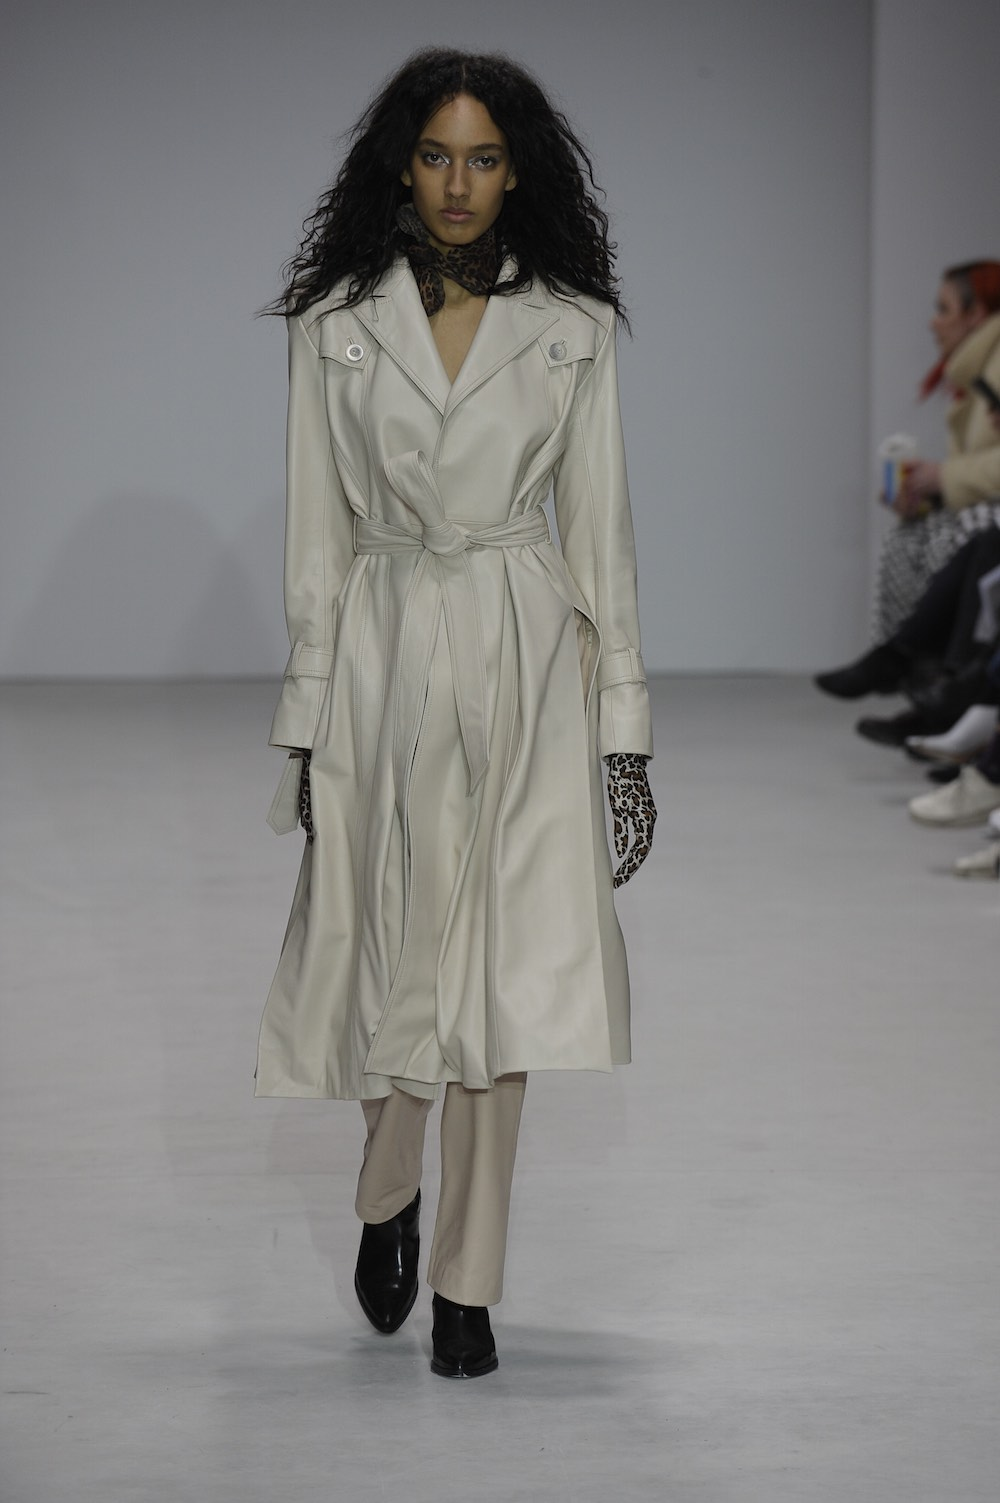 MA Fashion Design Technology Womenswear graduate Dmitry Gotsfrid. Image by Roger Dean.